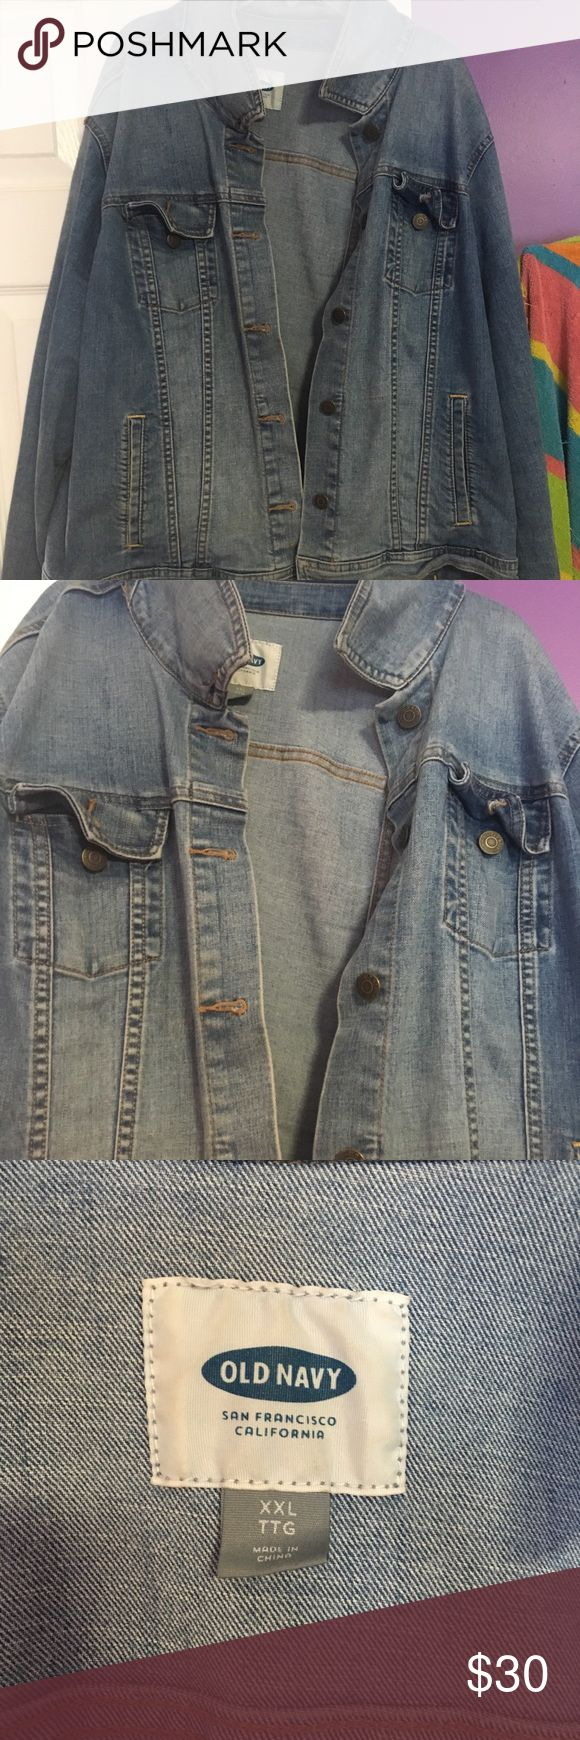 old navy jean jacket xxl worn a couple times, old navy jean jacket size xxl. super cute Old Navy Jackets & Coats Jean Jackets